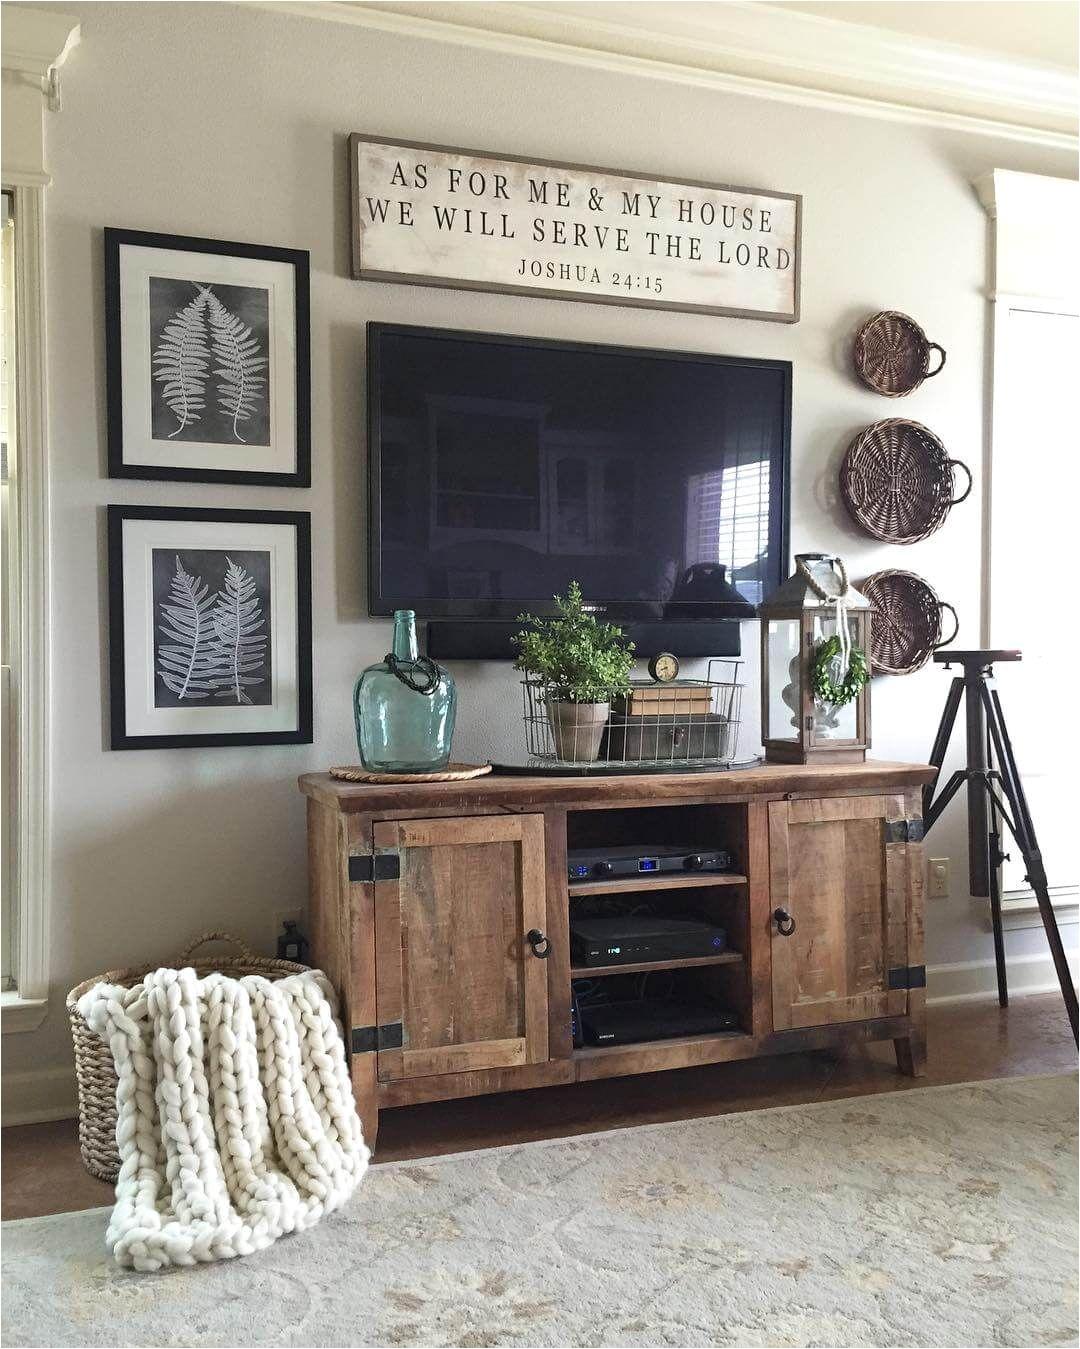 Living Room Shelf Decor Ideas 35 Rustic Farmhouse Living Room Design and Decor Ideas for Your Home